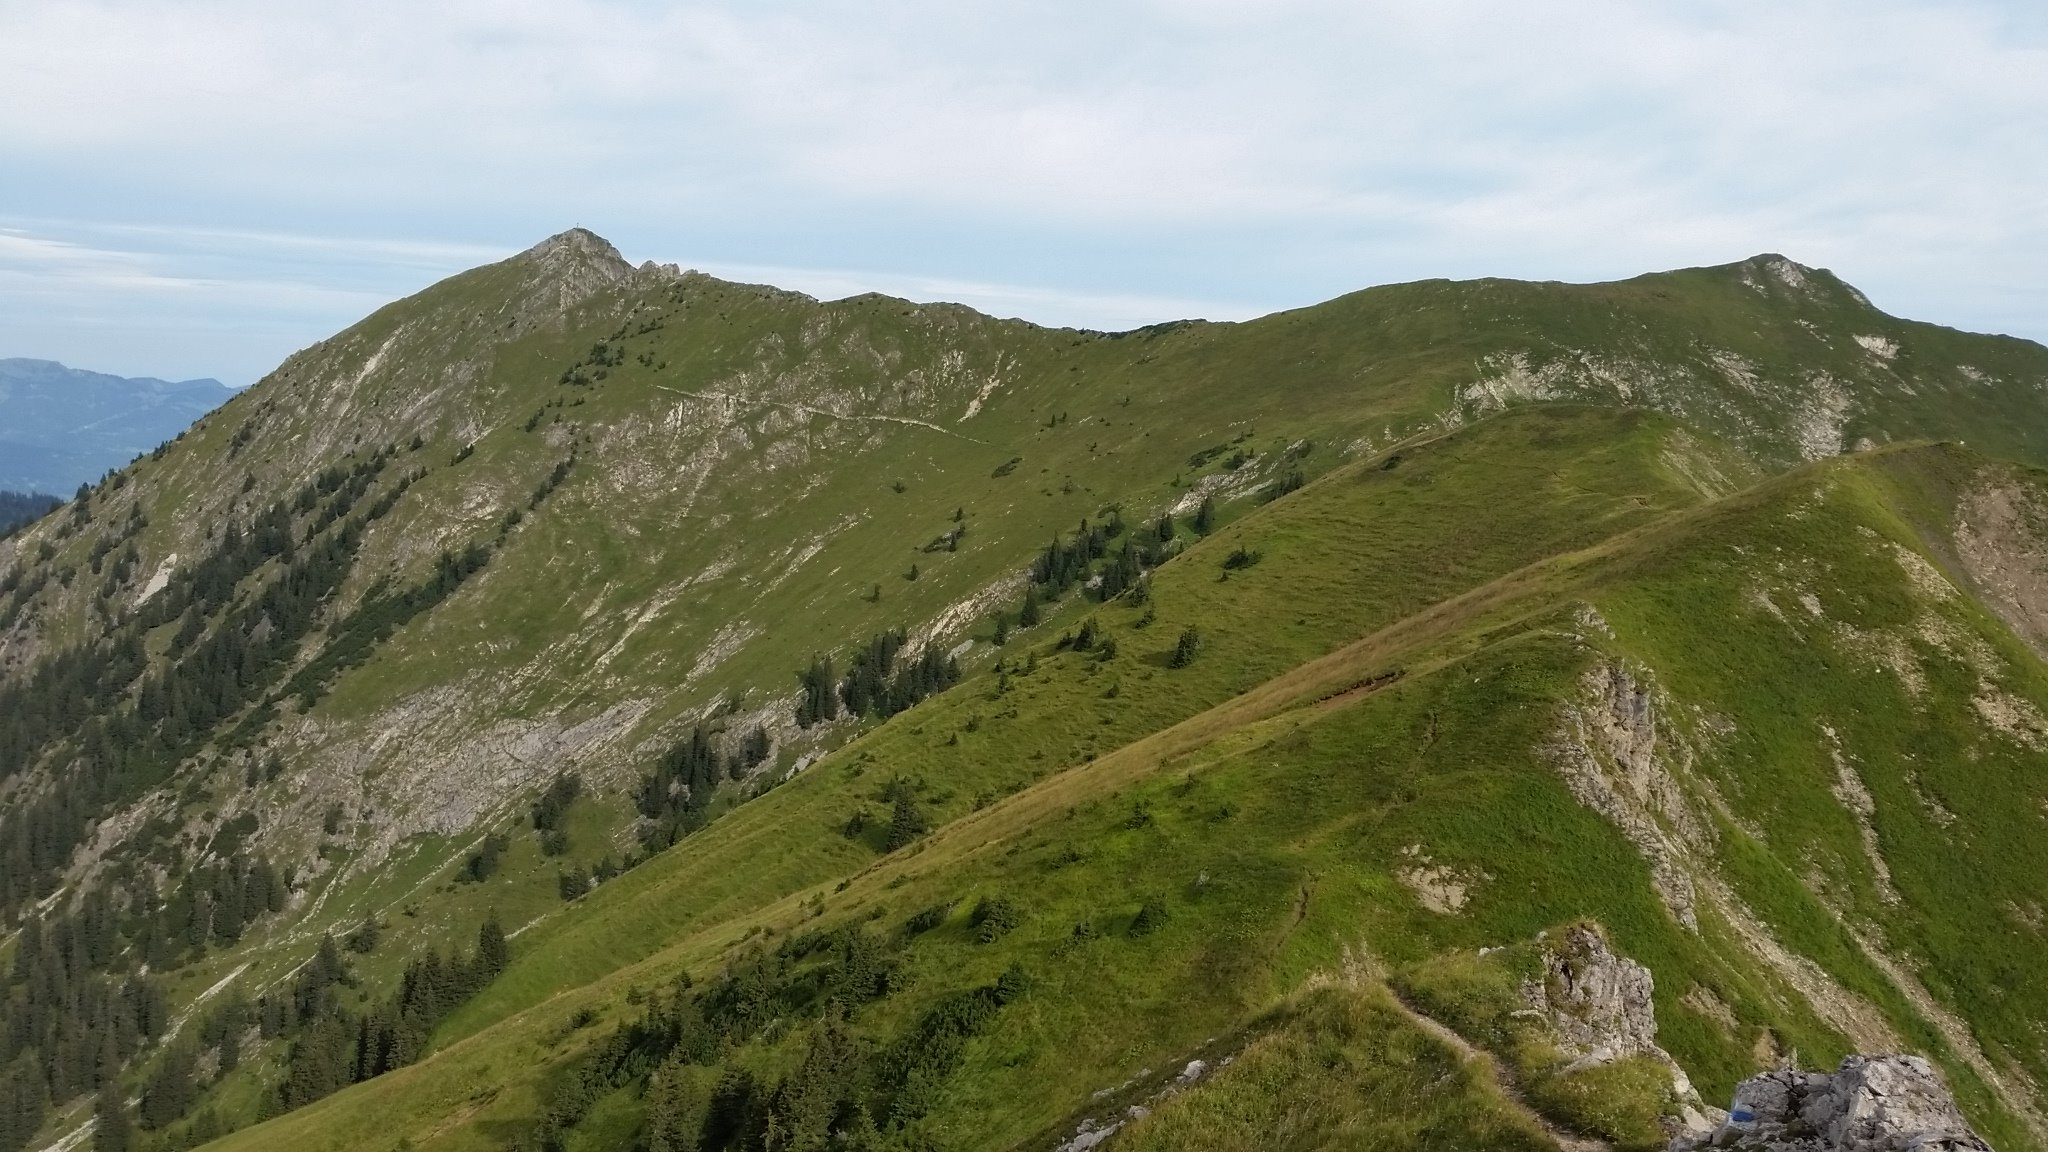 Ziele - Große Klammspitze (2.280m): Flowige Trails auf dem Weg zum Heubatkopf (© airfreshing.com)